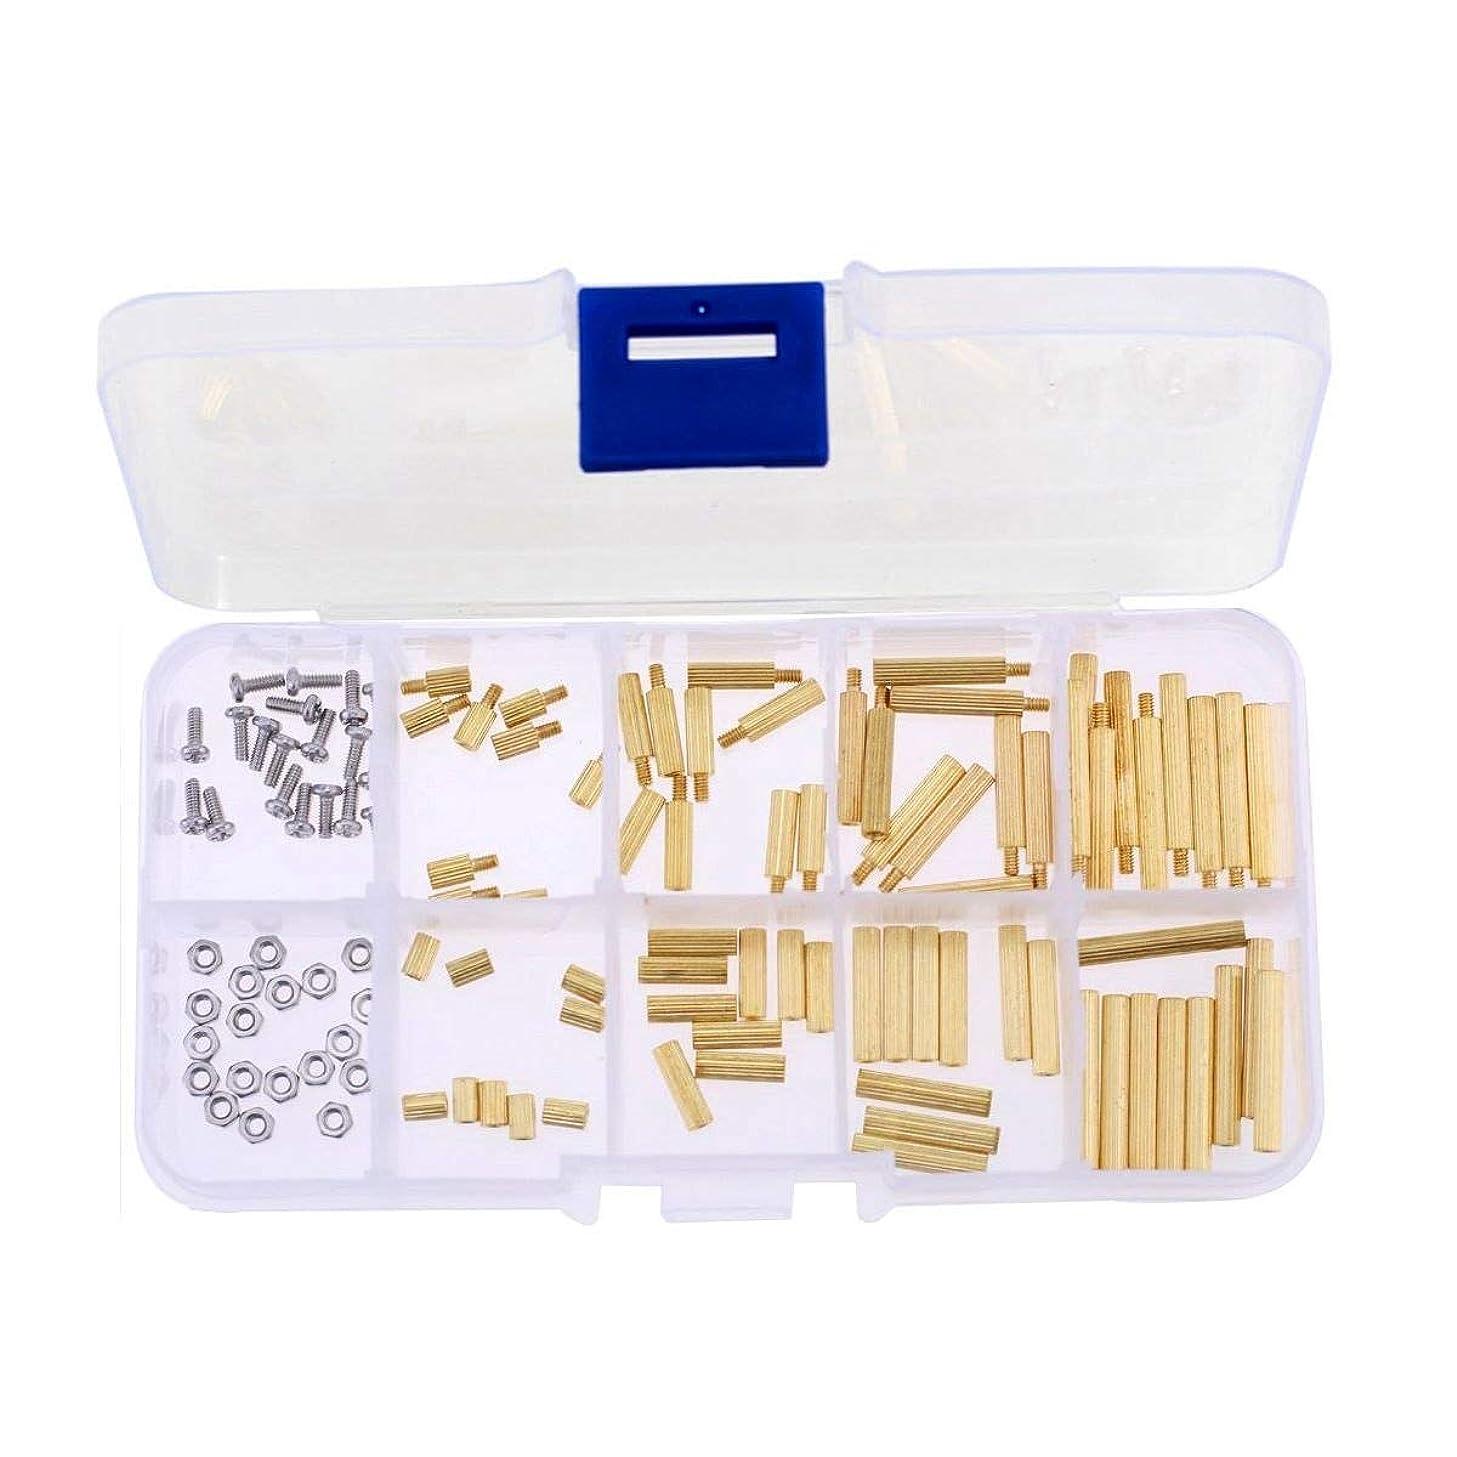 Nuts Wholesales 120pcs M2 Male Female Brass Spacer Standoff Screw Nut Assortment Kit(Brass M2)